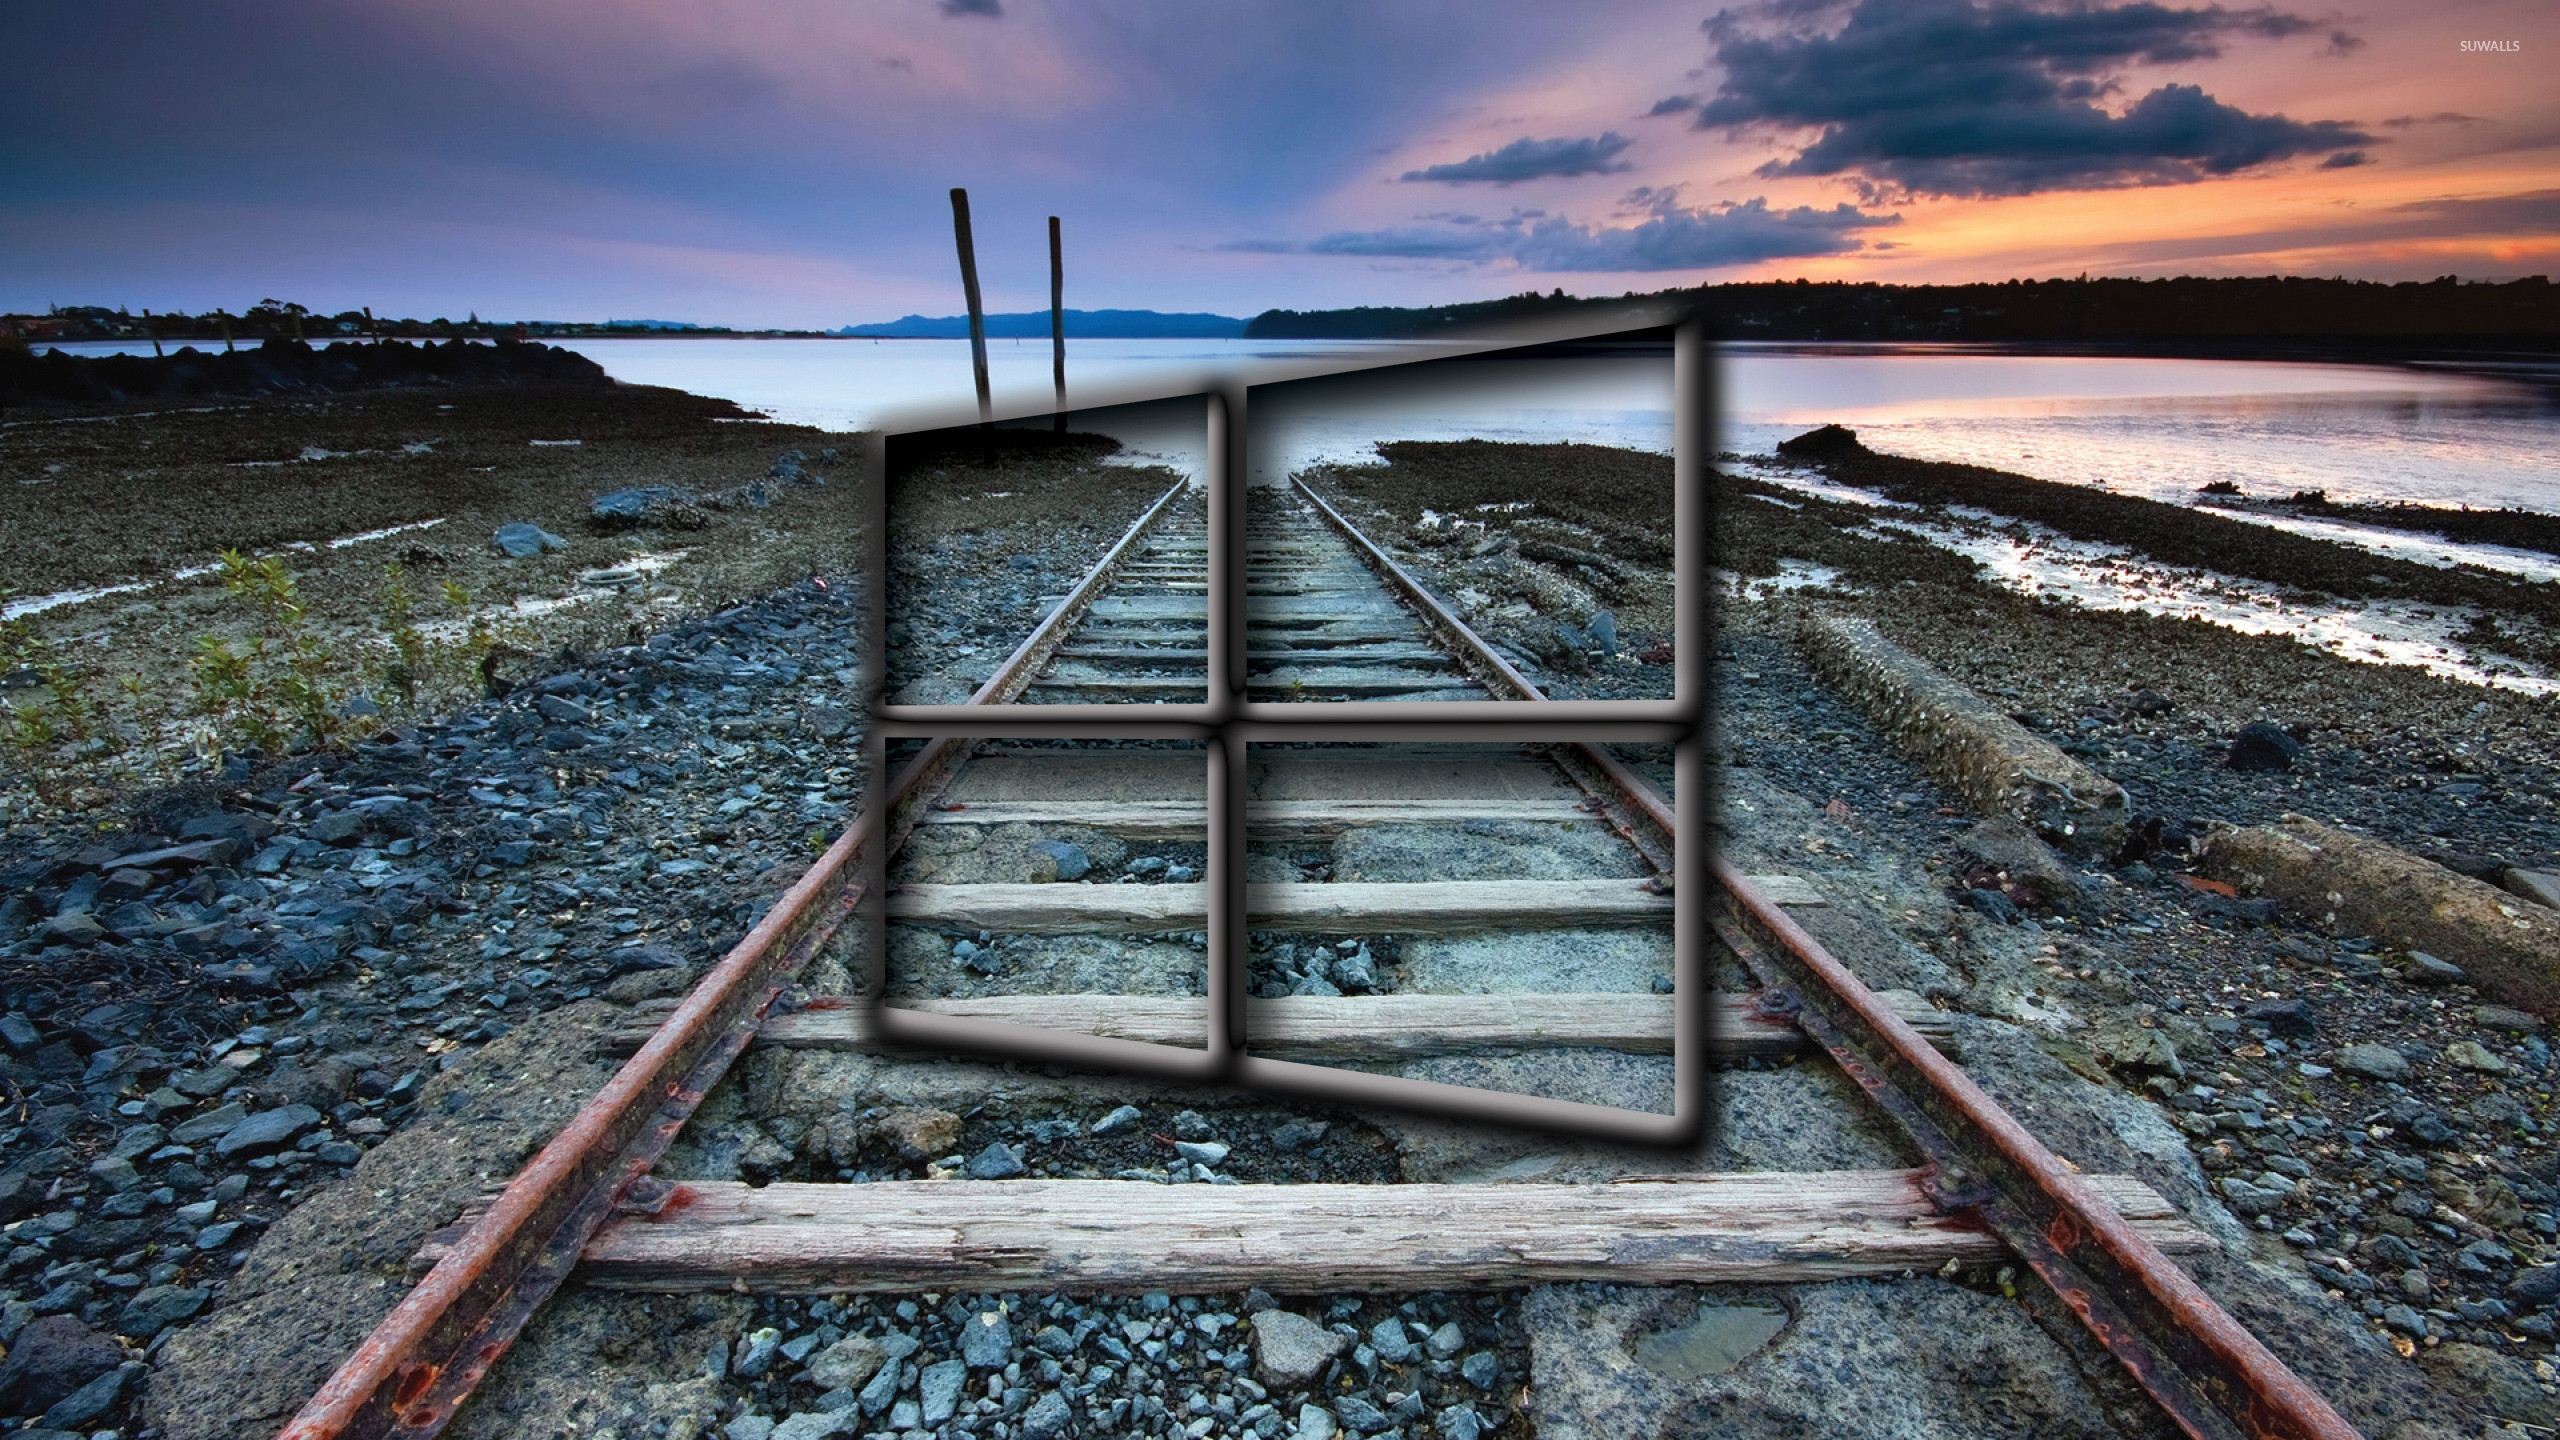 Windows 10 transparent logo over the railway tracks wallpaper